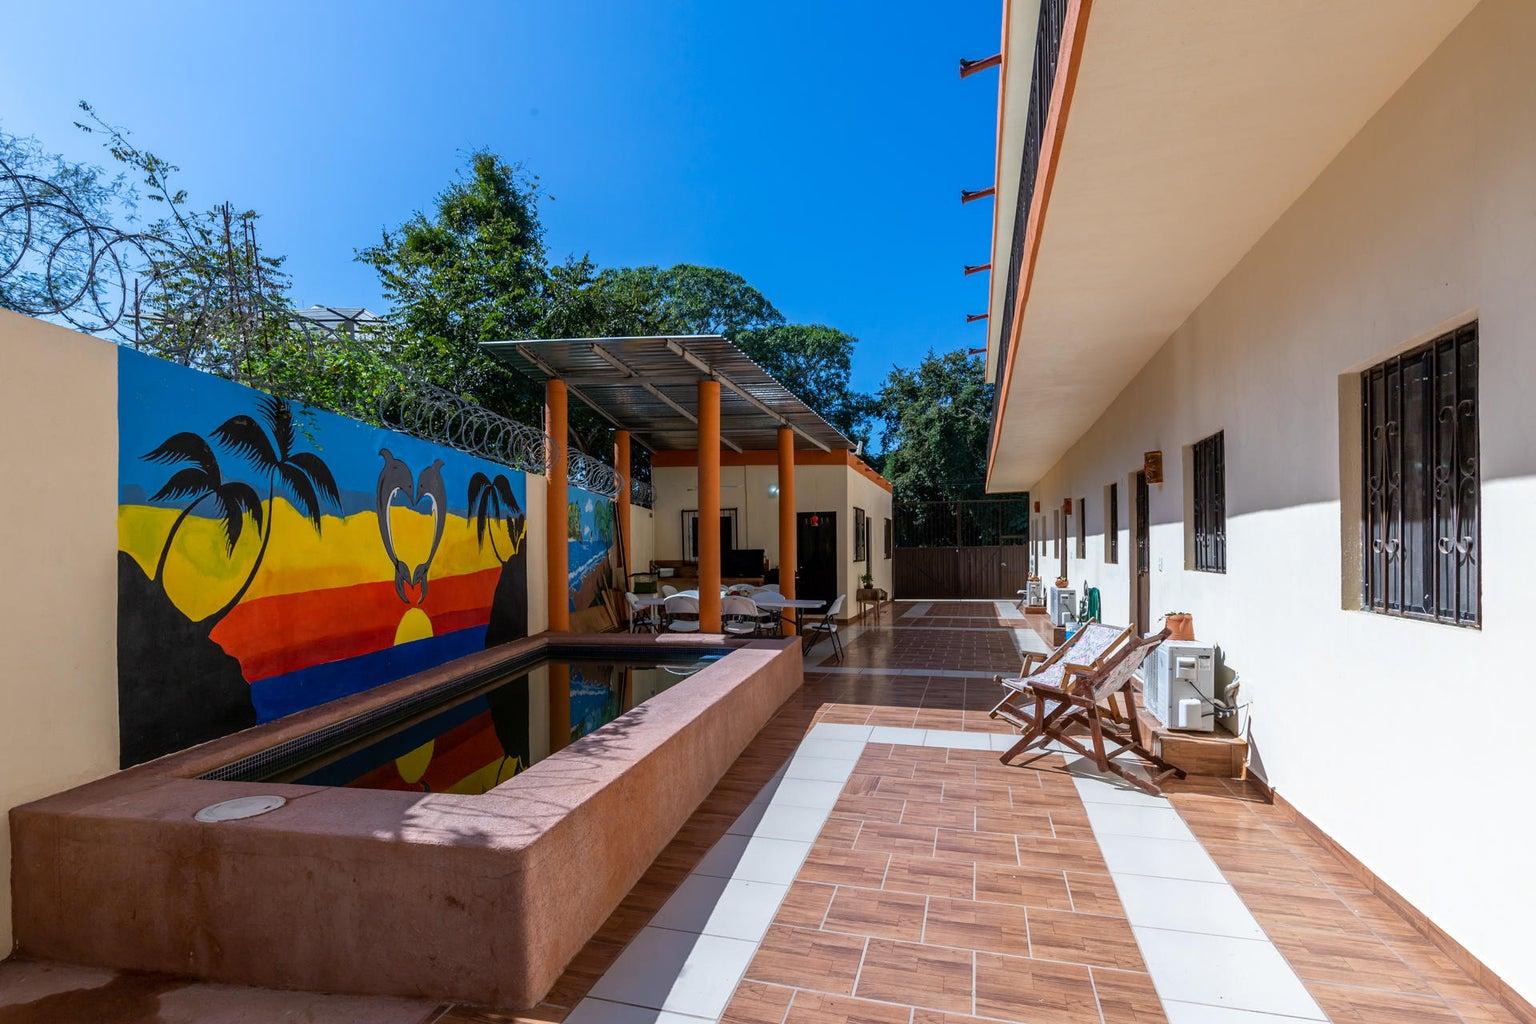 Hotel Mirlo Common Areas - 7